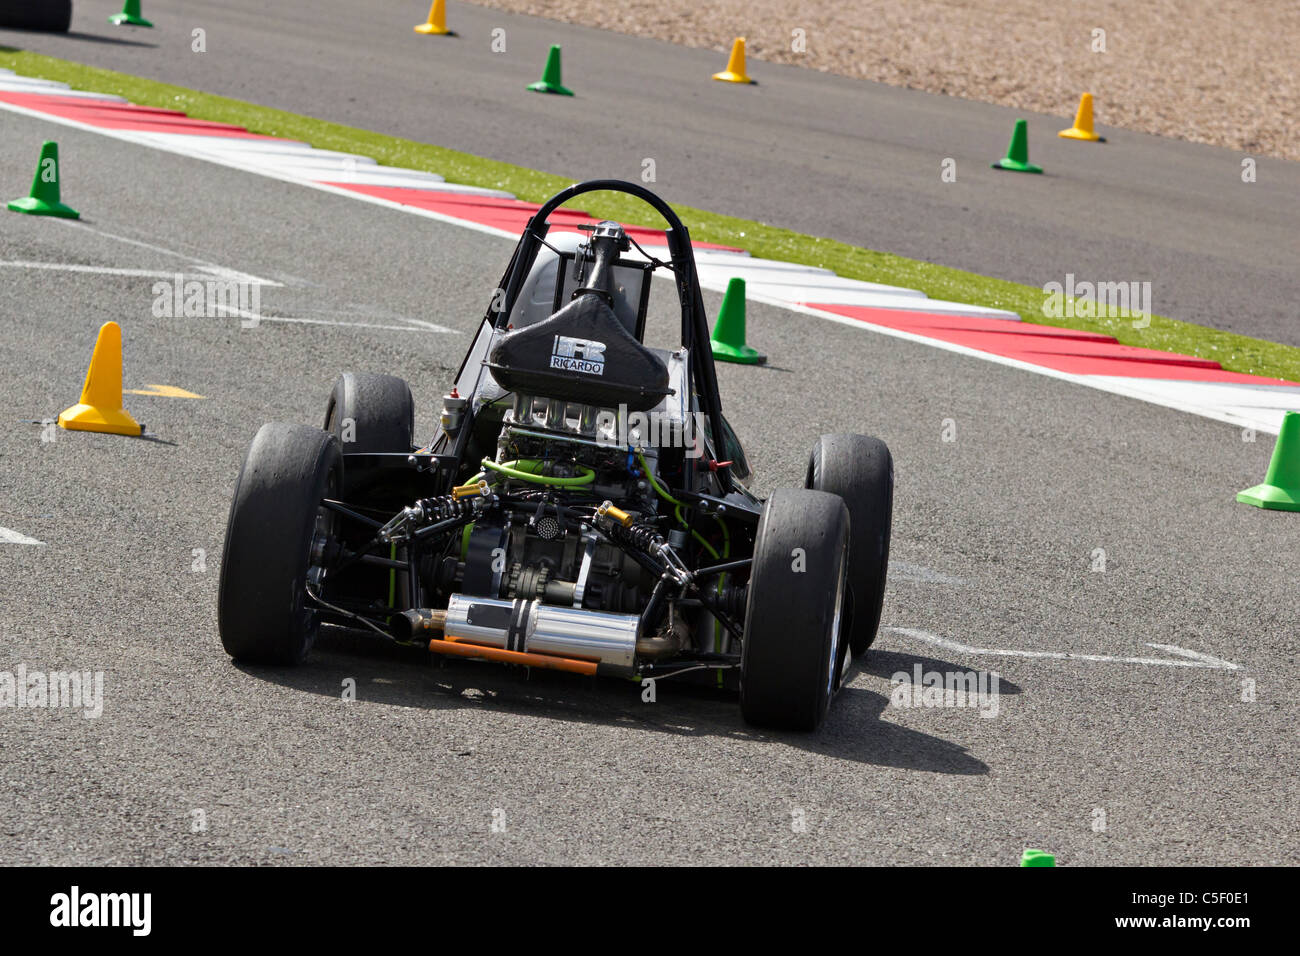 Formula Student Racing Car Motorsport At Silverstone Stock Photo ...